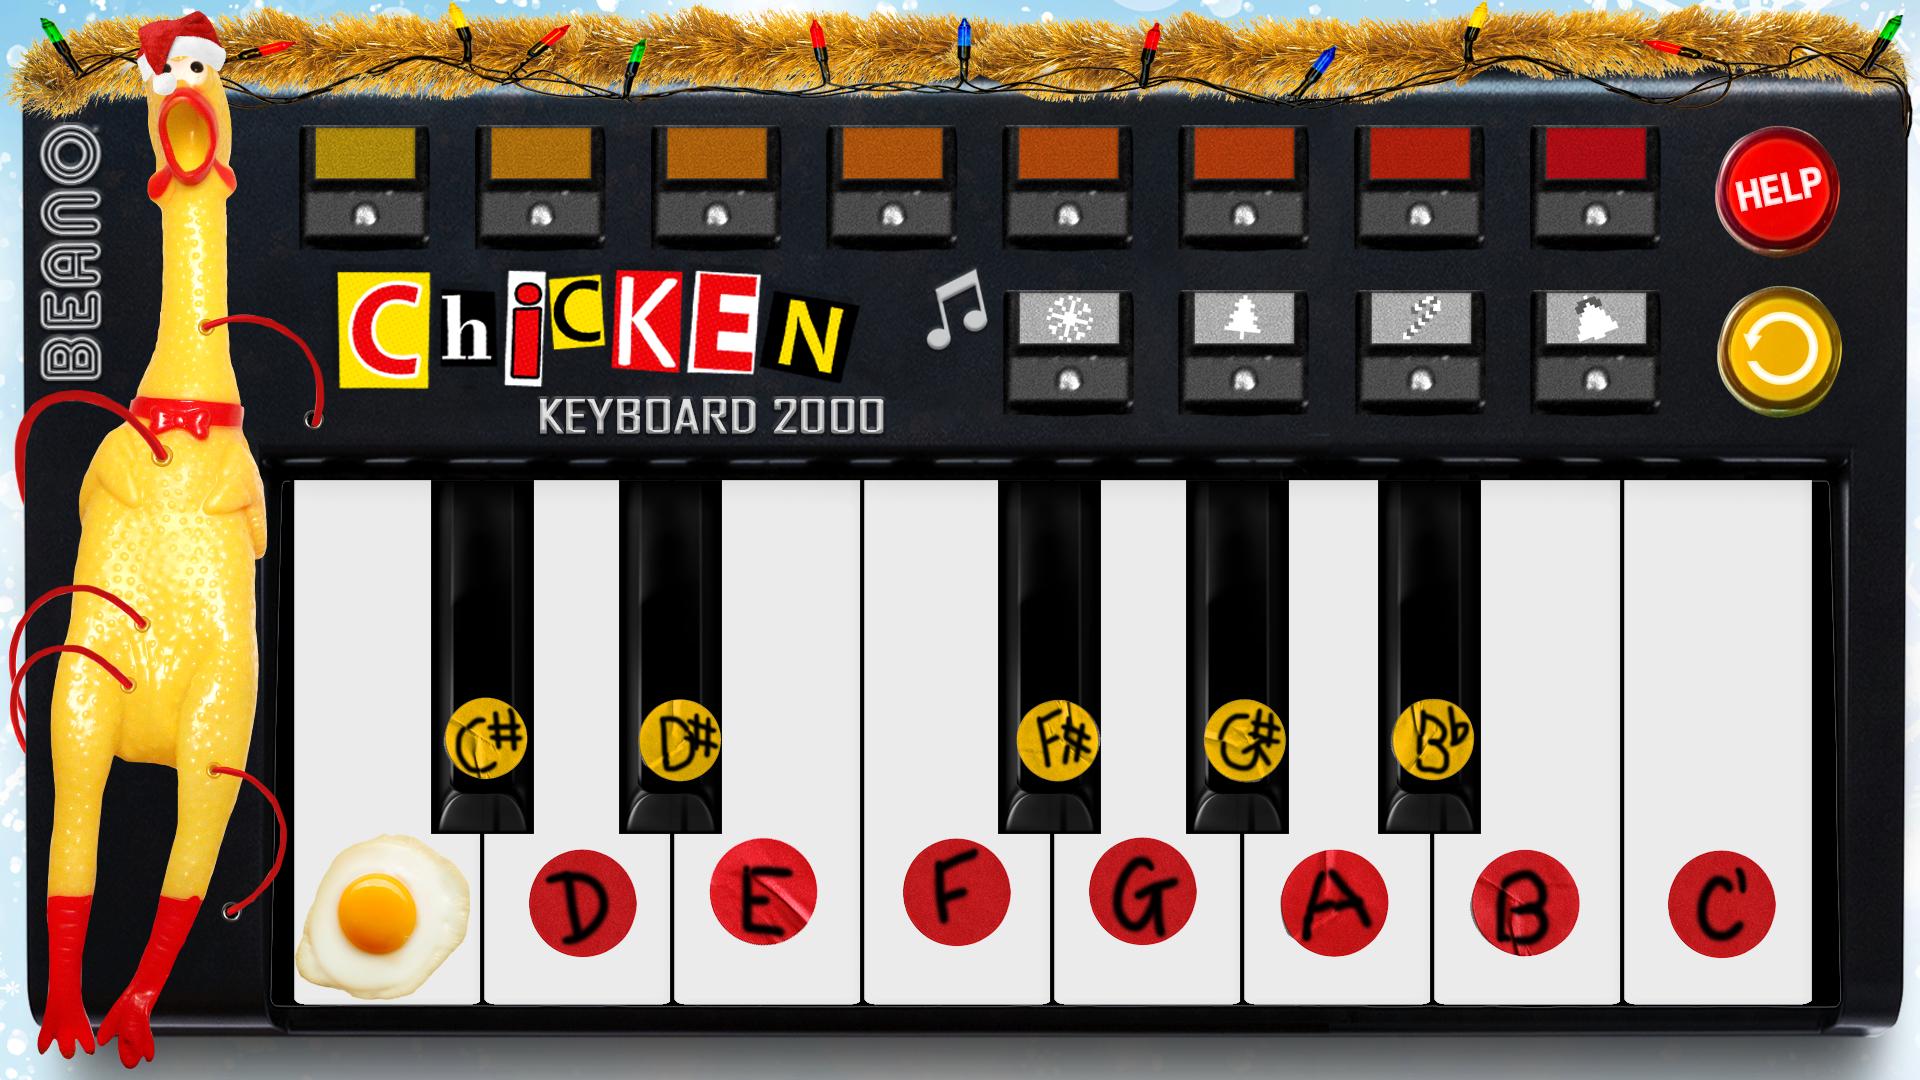 Rubber Chicken Keyboard